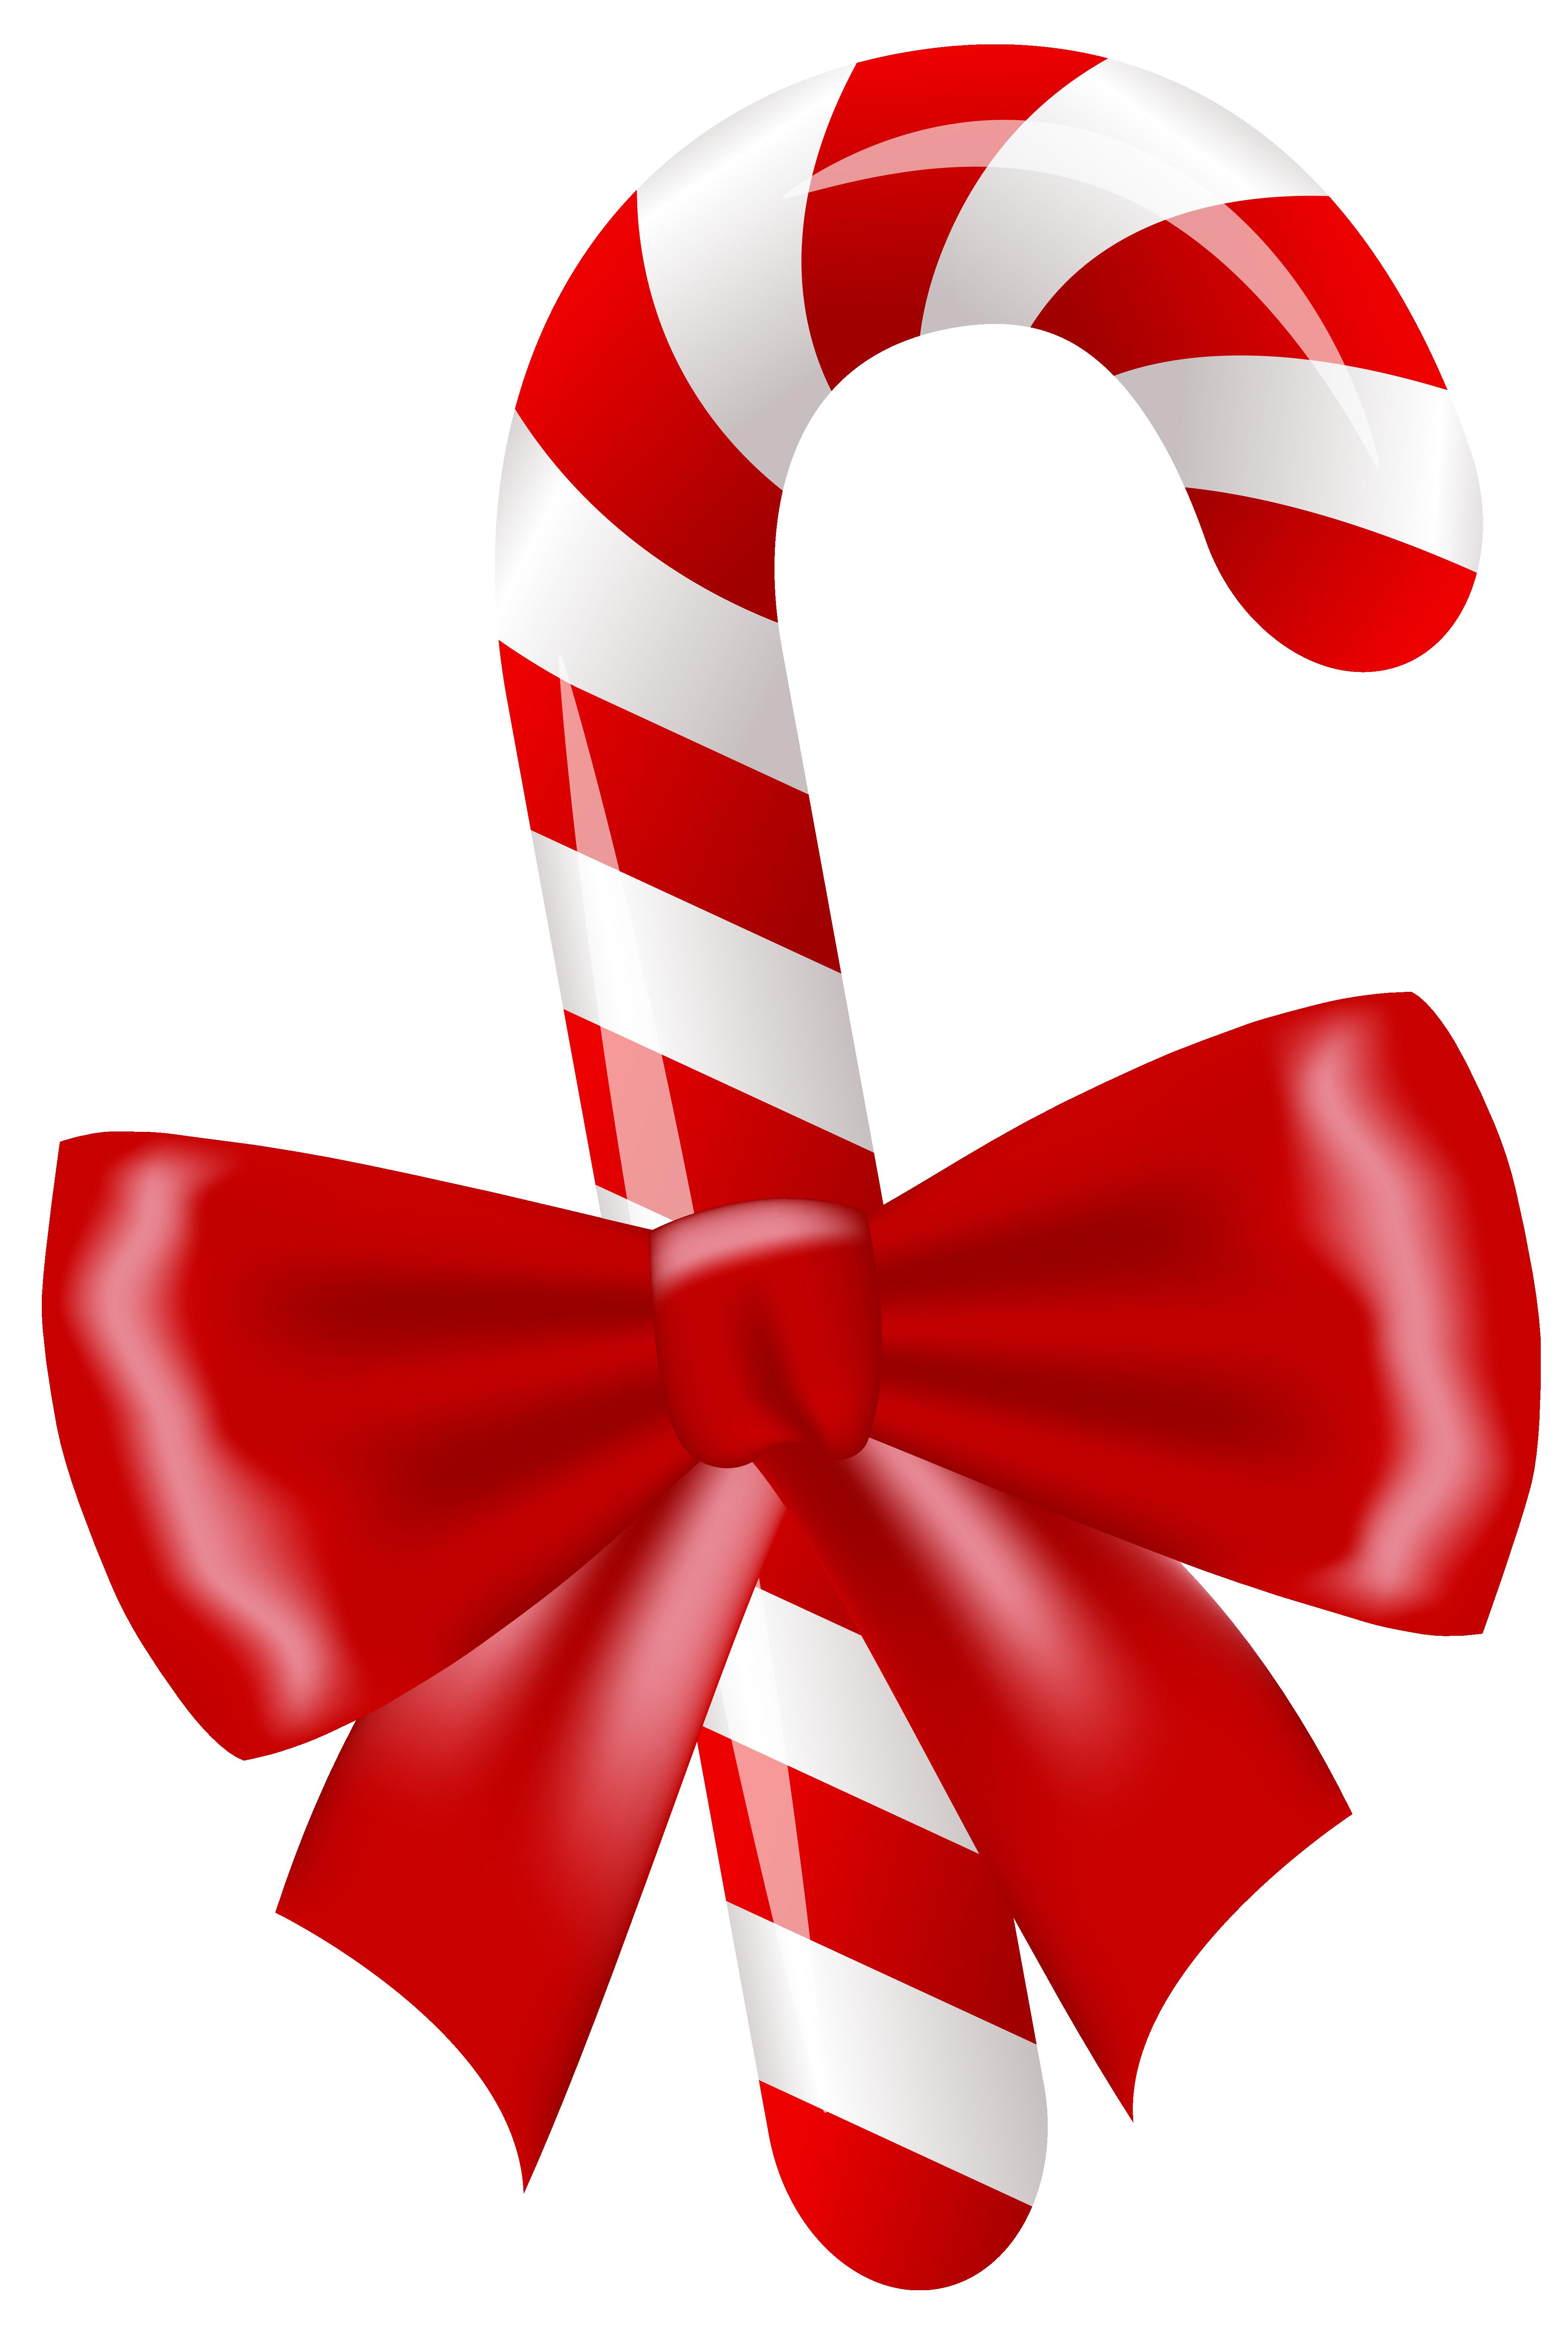 Christmas Candy Images  Christmas candy cane image black and white techFlourish